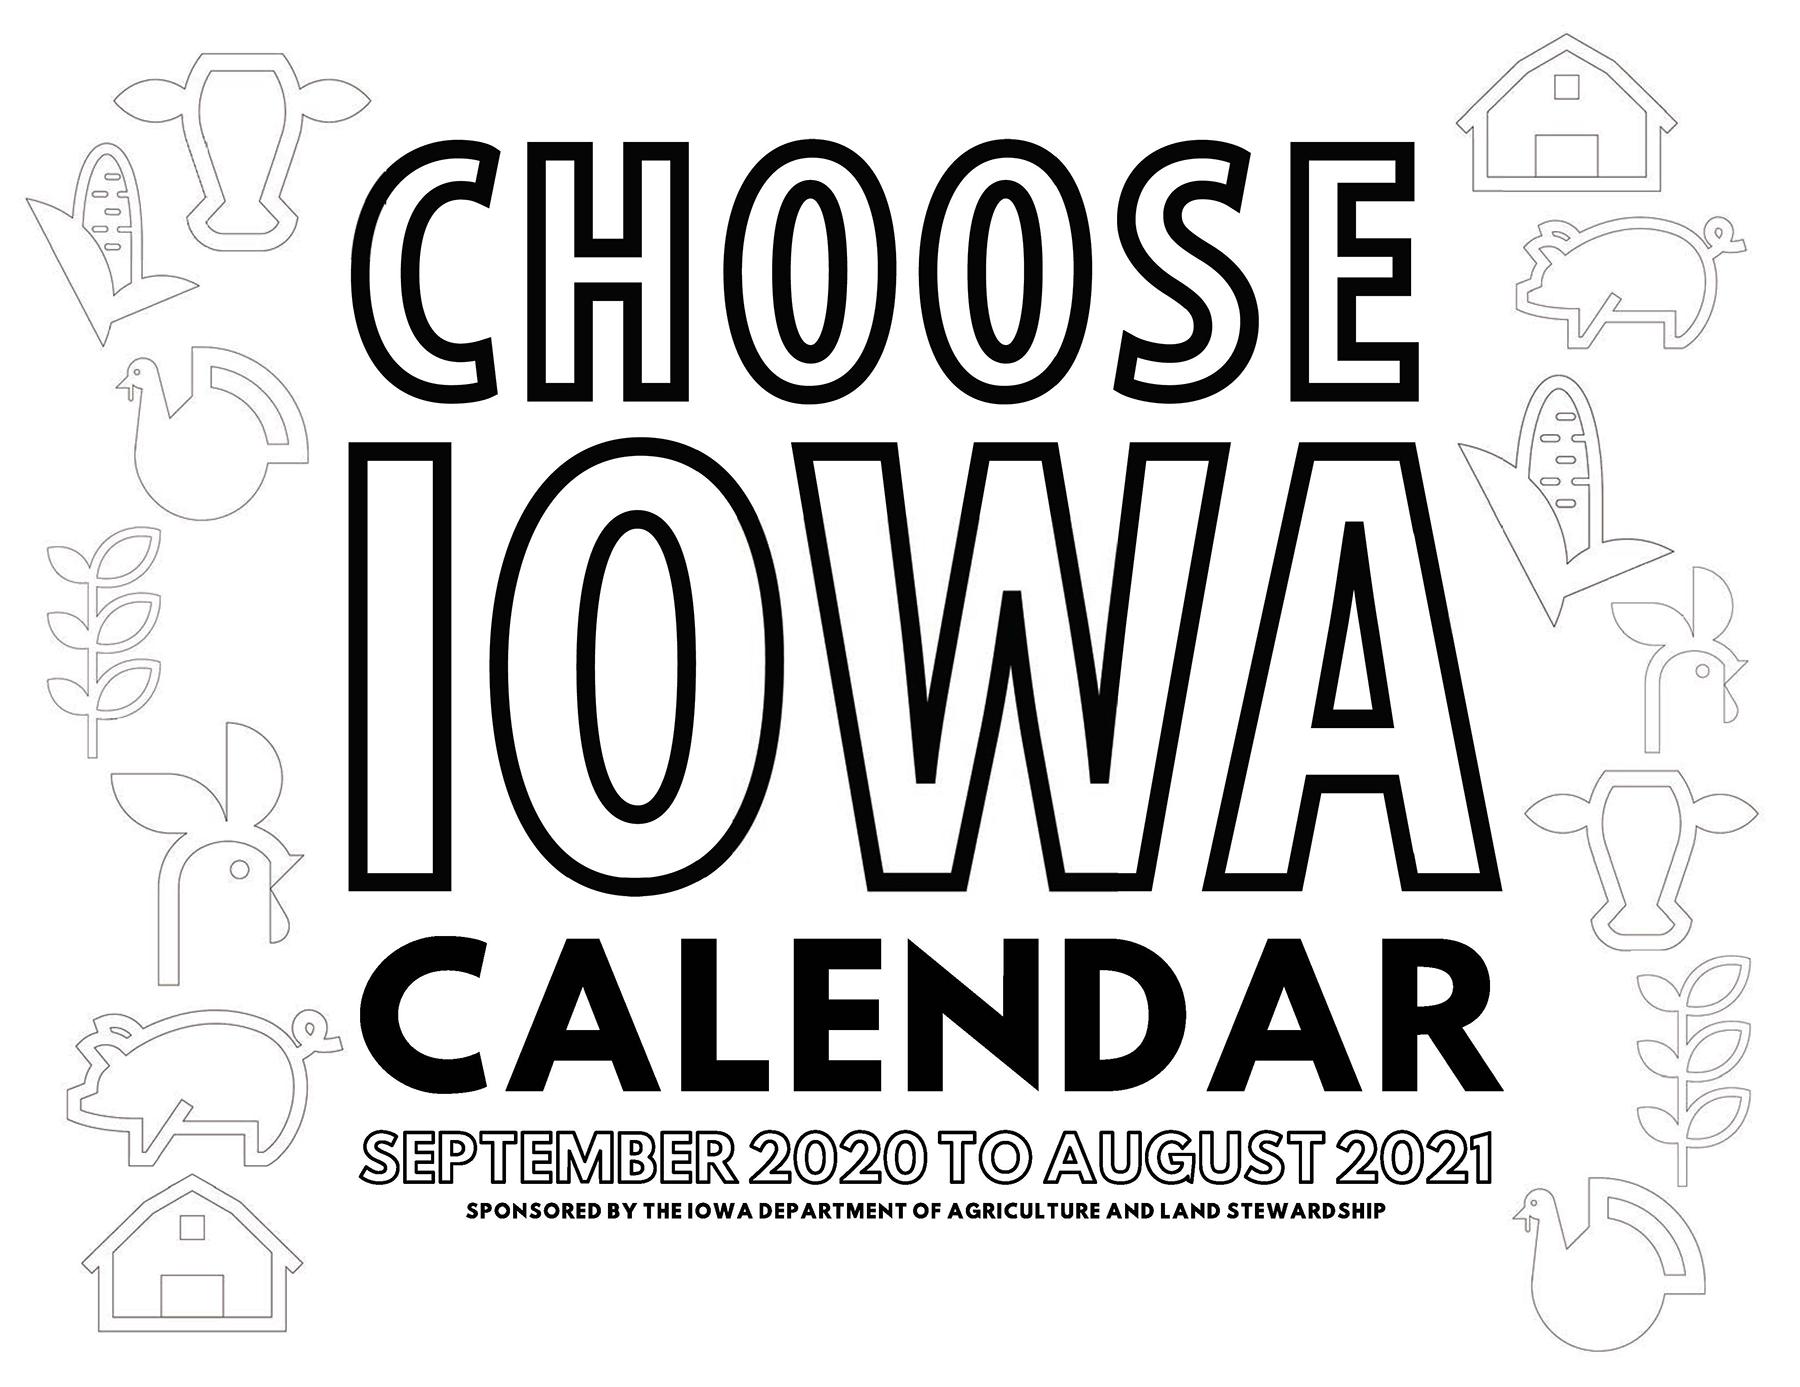 Secretary Naig Announces 2020 Choose Iowa Calendar Contest With Regard To Des Moines Calendar Of Events 2021